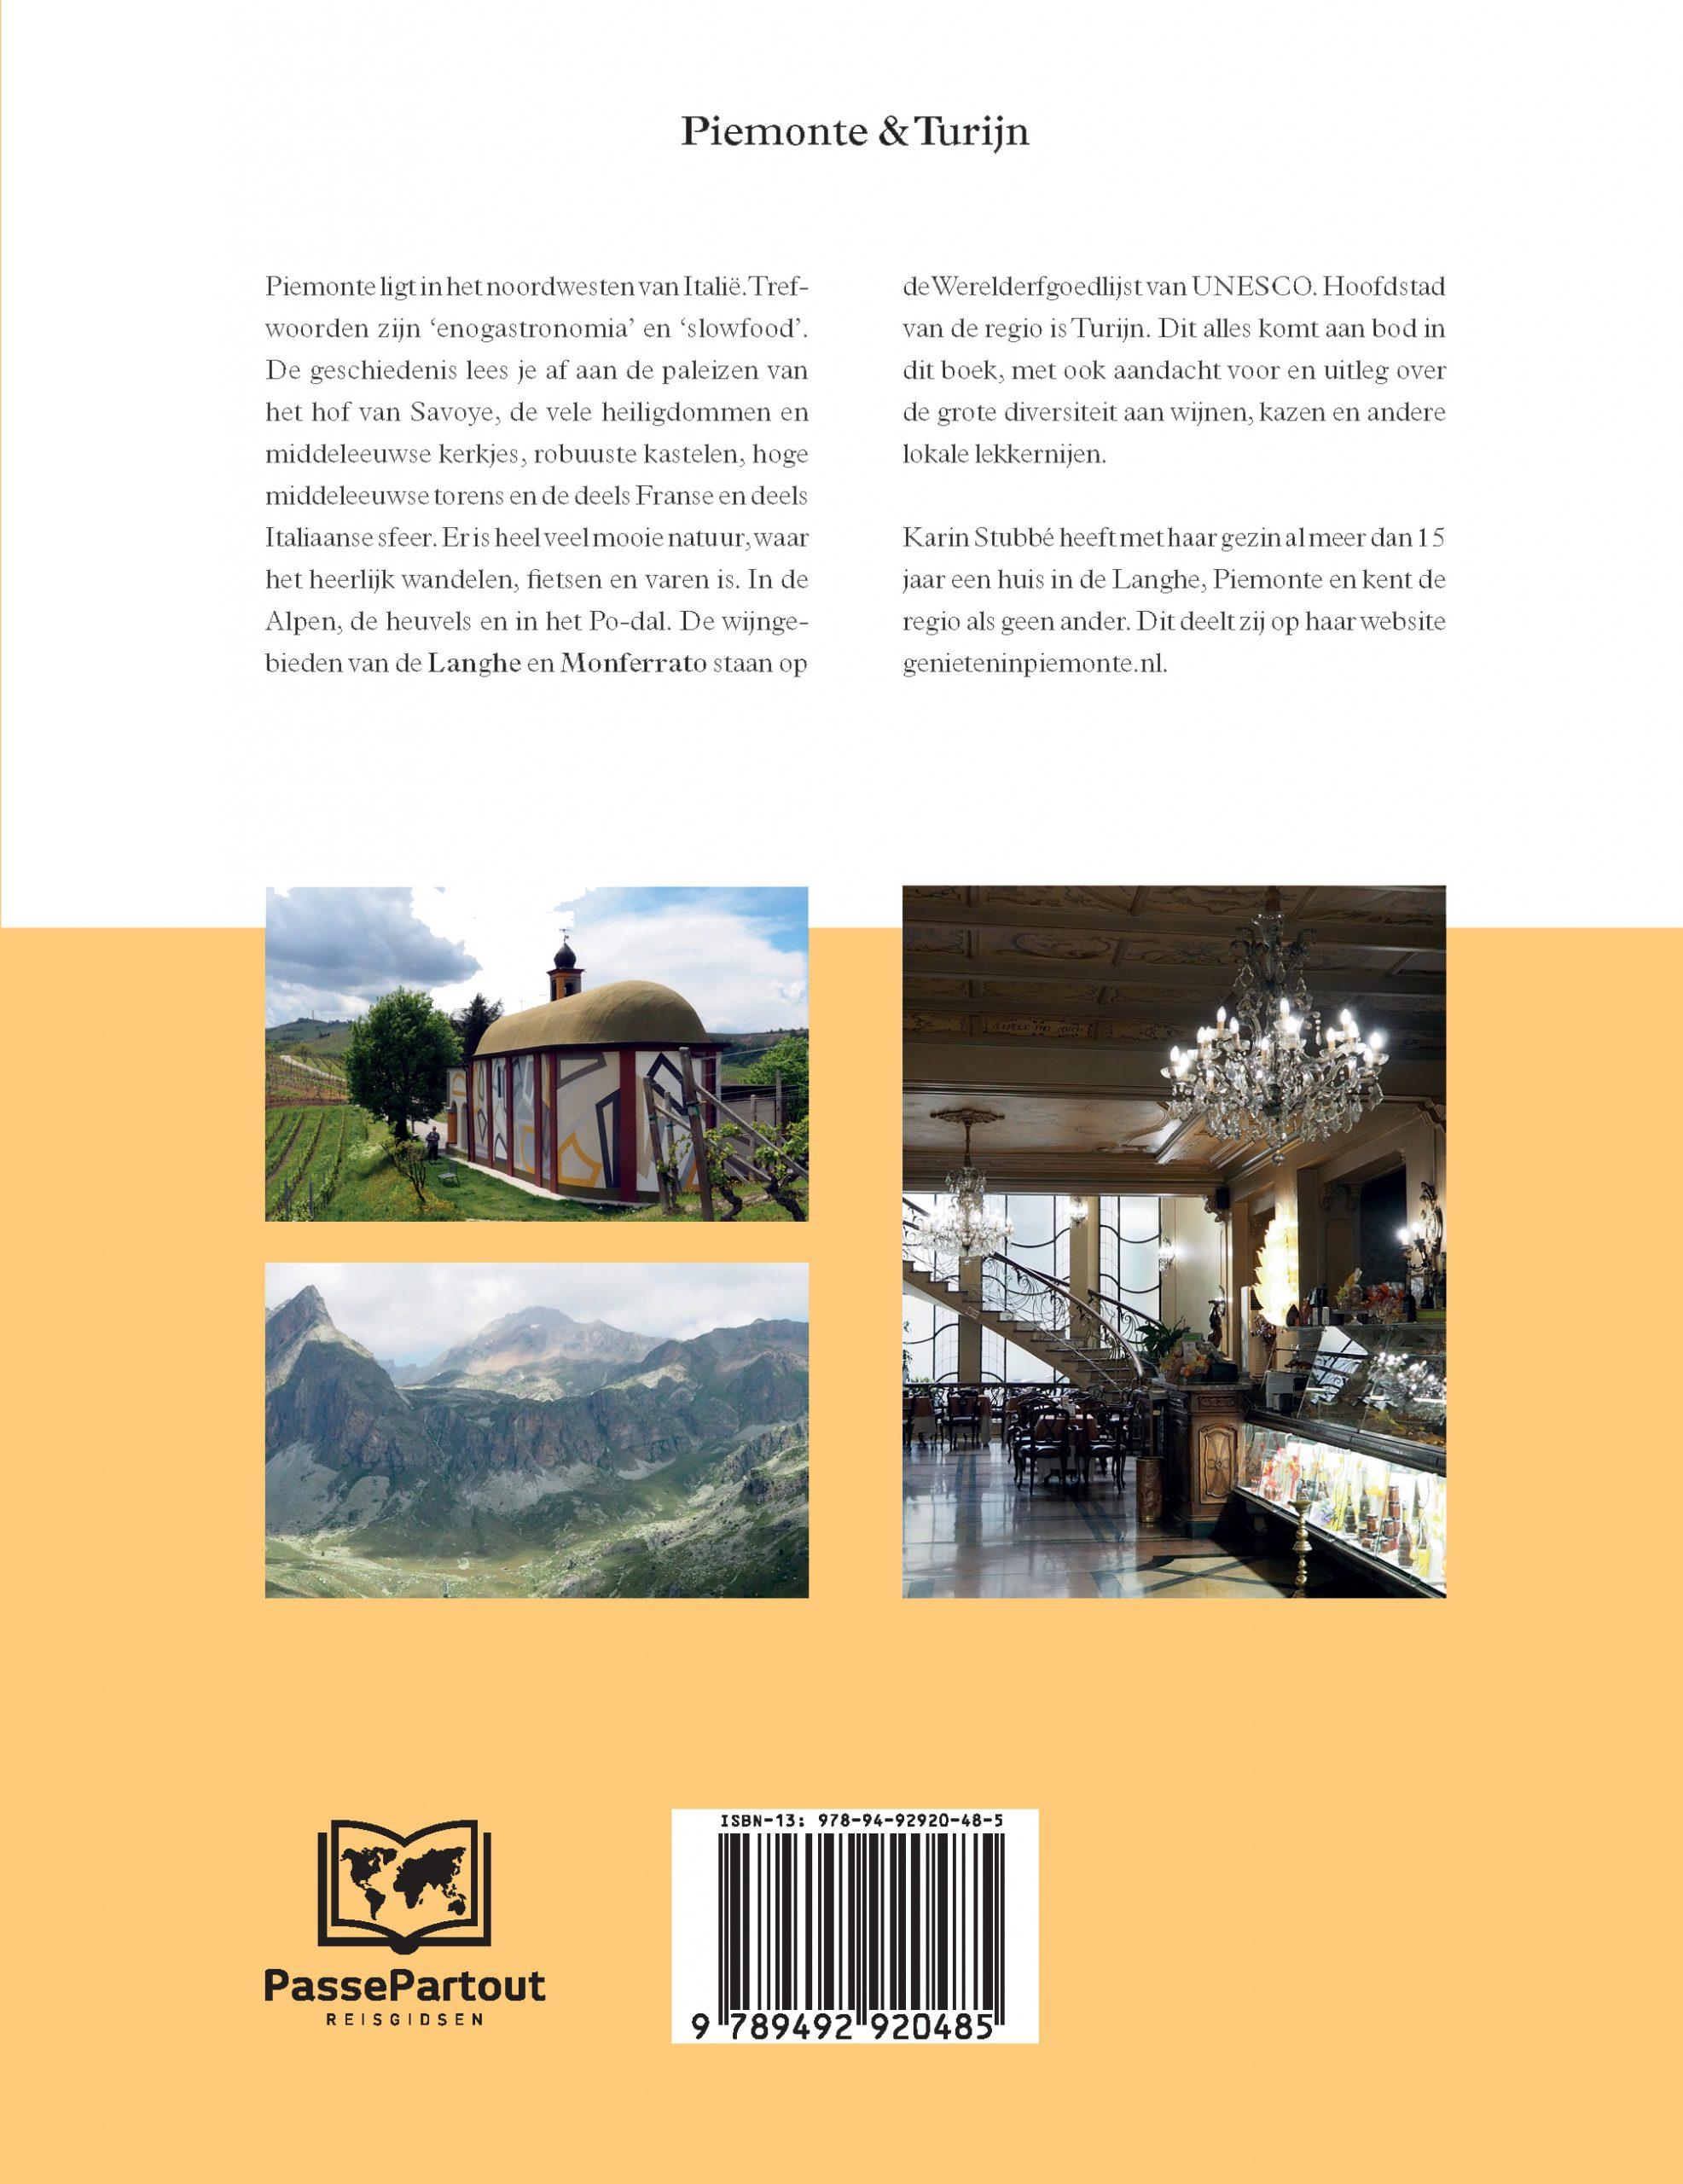 Cover_Piemonte_Turijn_2020.indd